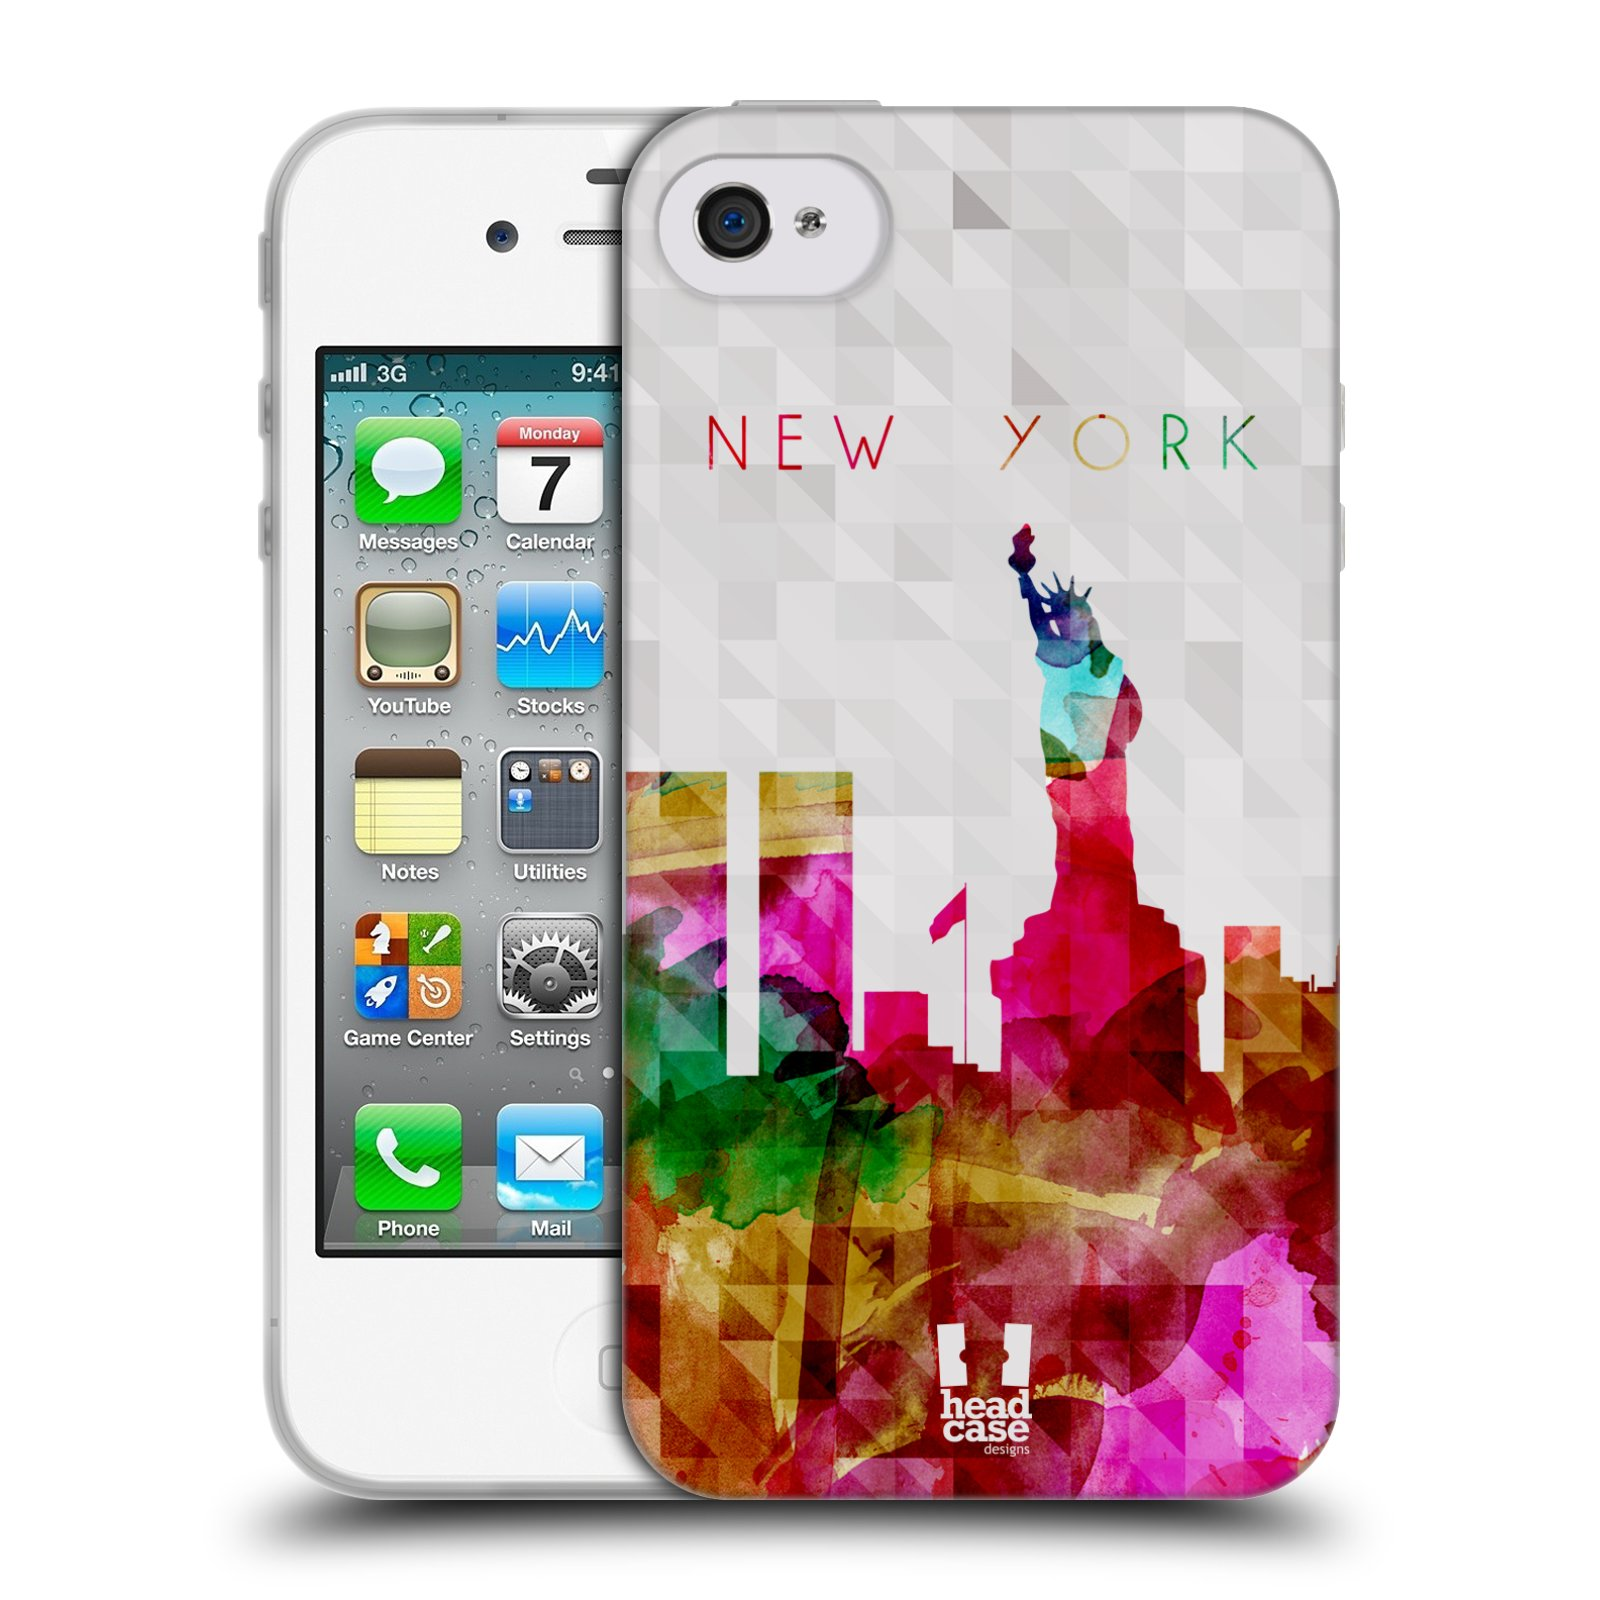 HEAD CASE silikonový obal na mobil Apple Iphone 4/4S vzor Vodní barva města silueta NEW YORK USA SOCHA SVOBODY